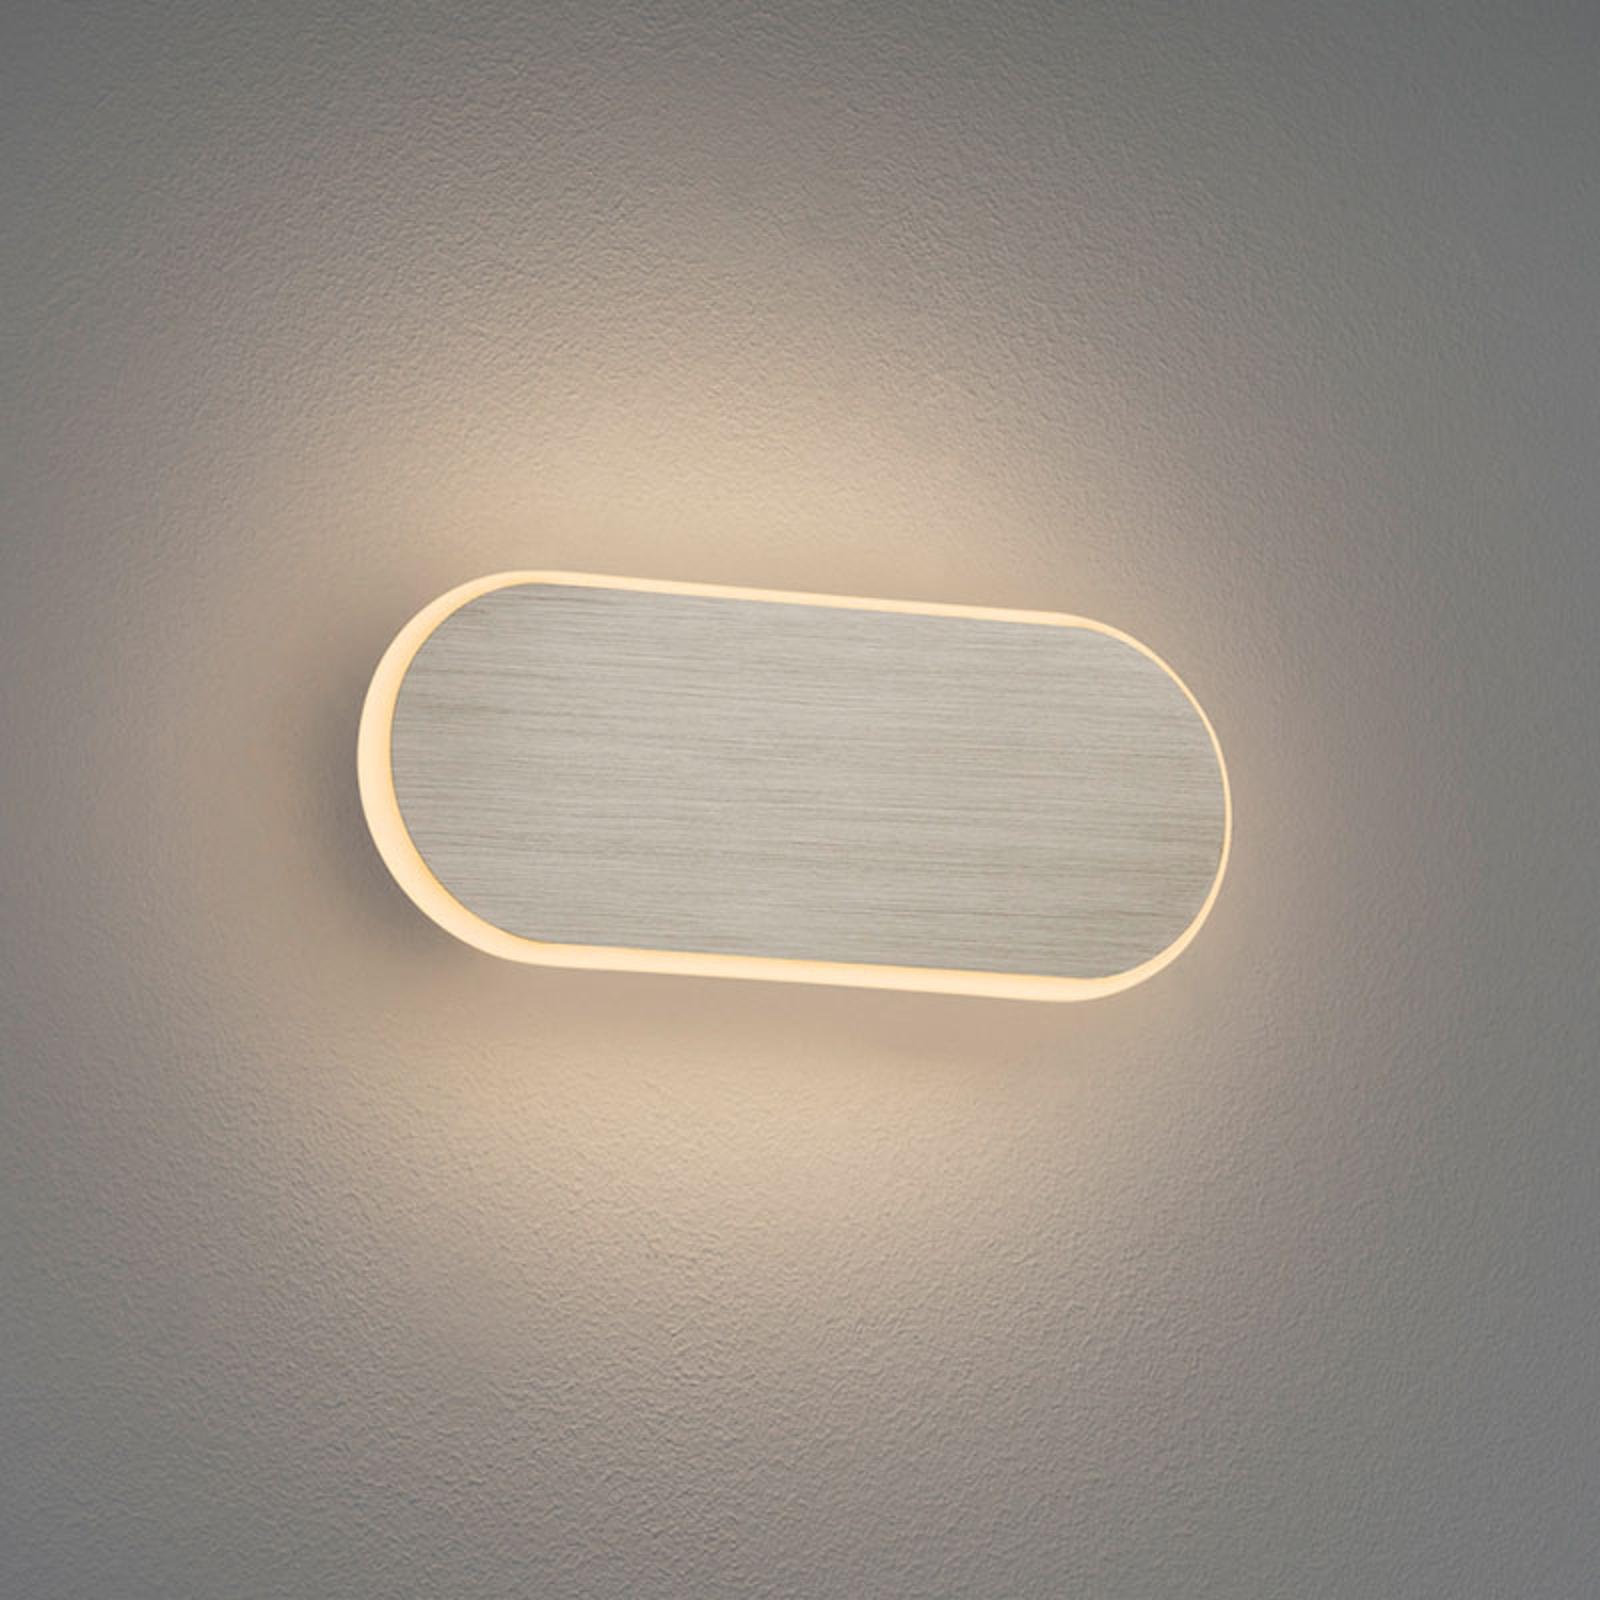 LED wandlamp Carlo, SwitchDim, 20 cm, nikkel mat